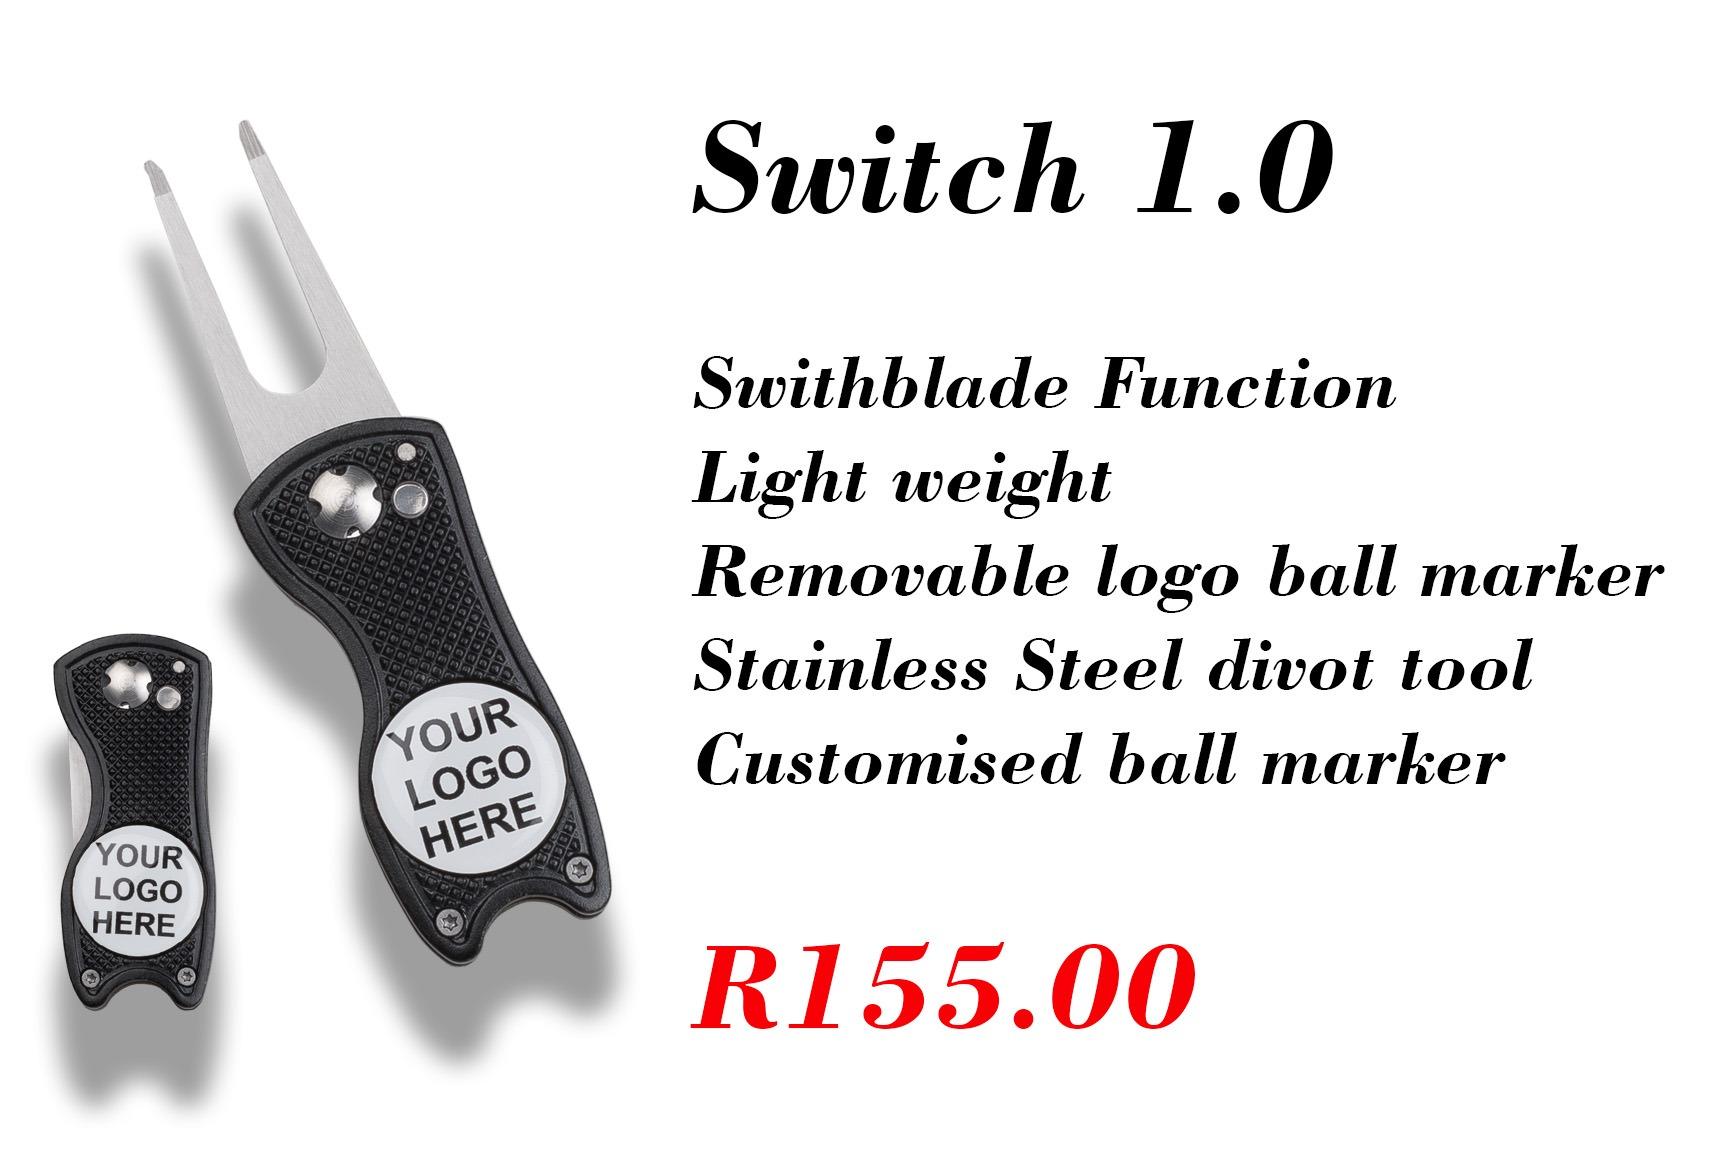 switch divot tool